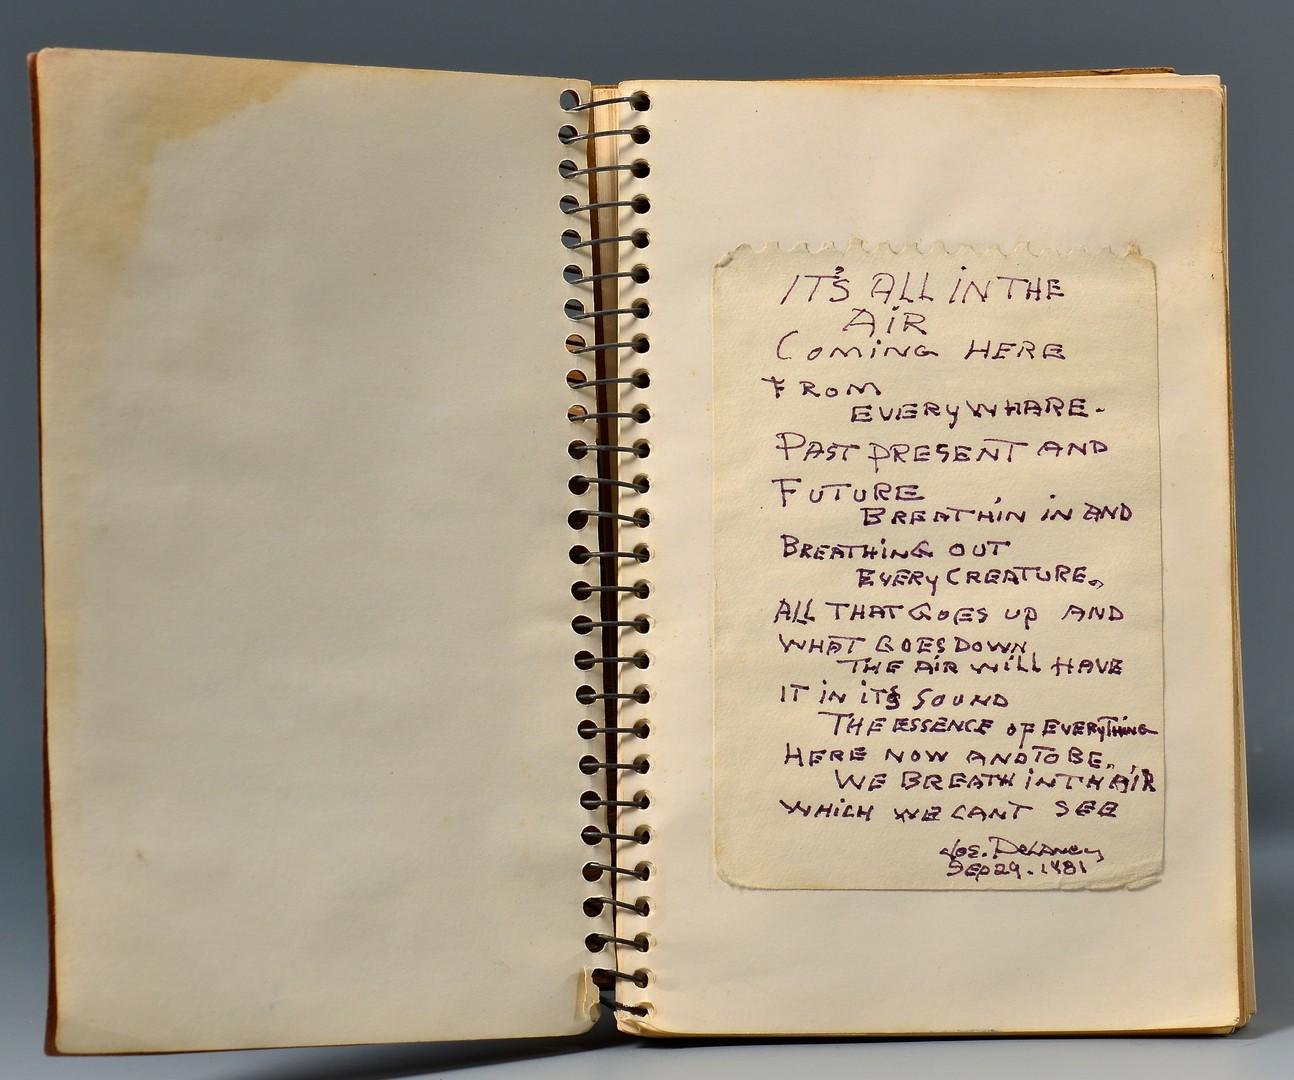 Lot 442: TN Joseph Delaney Archive, 3 Items